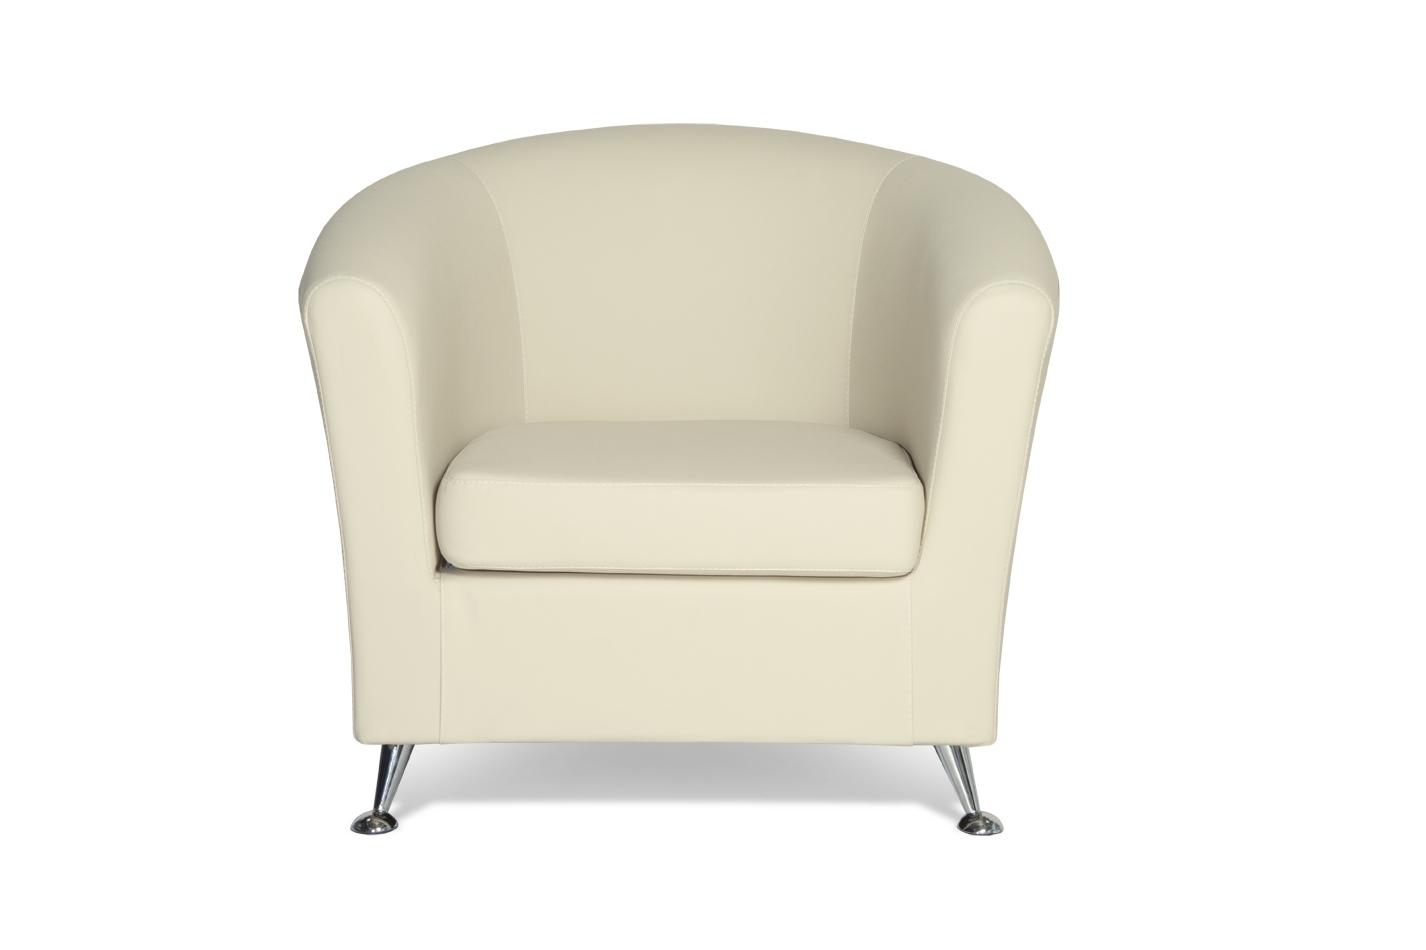 Бонн кресло К/З орегон 3023 - 1